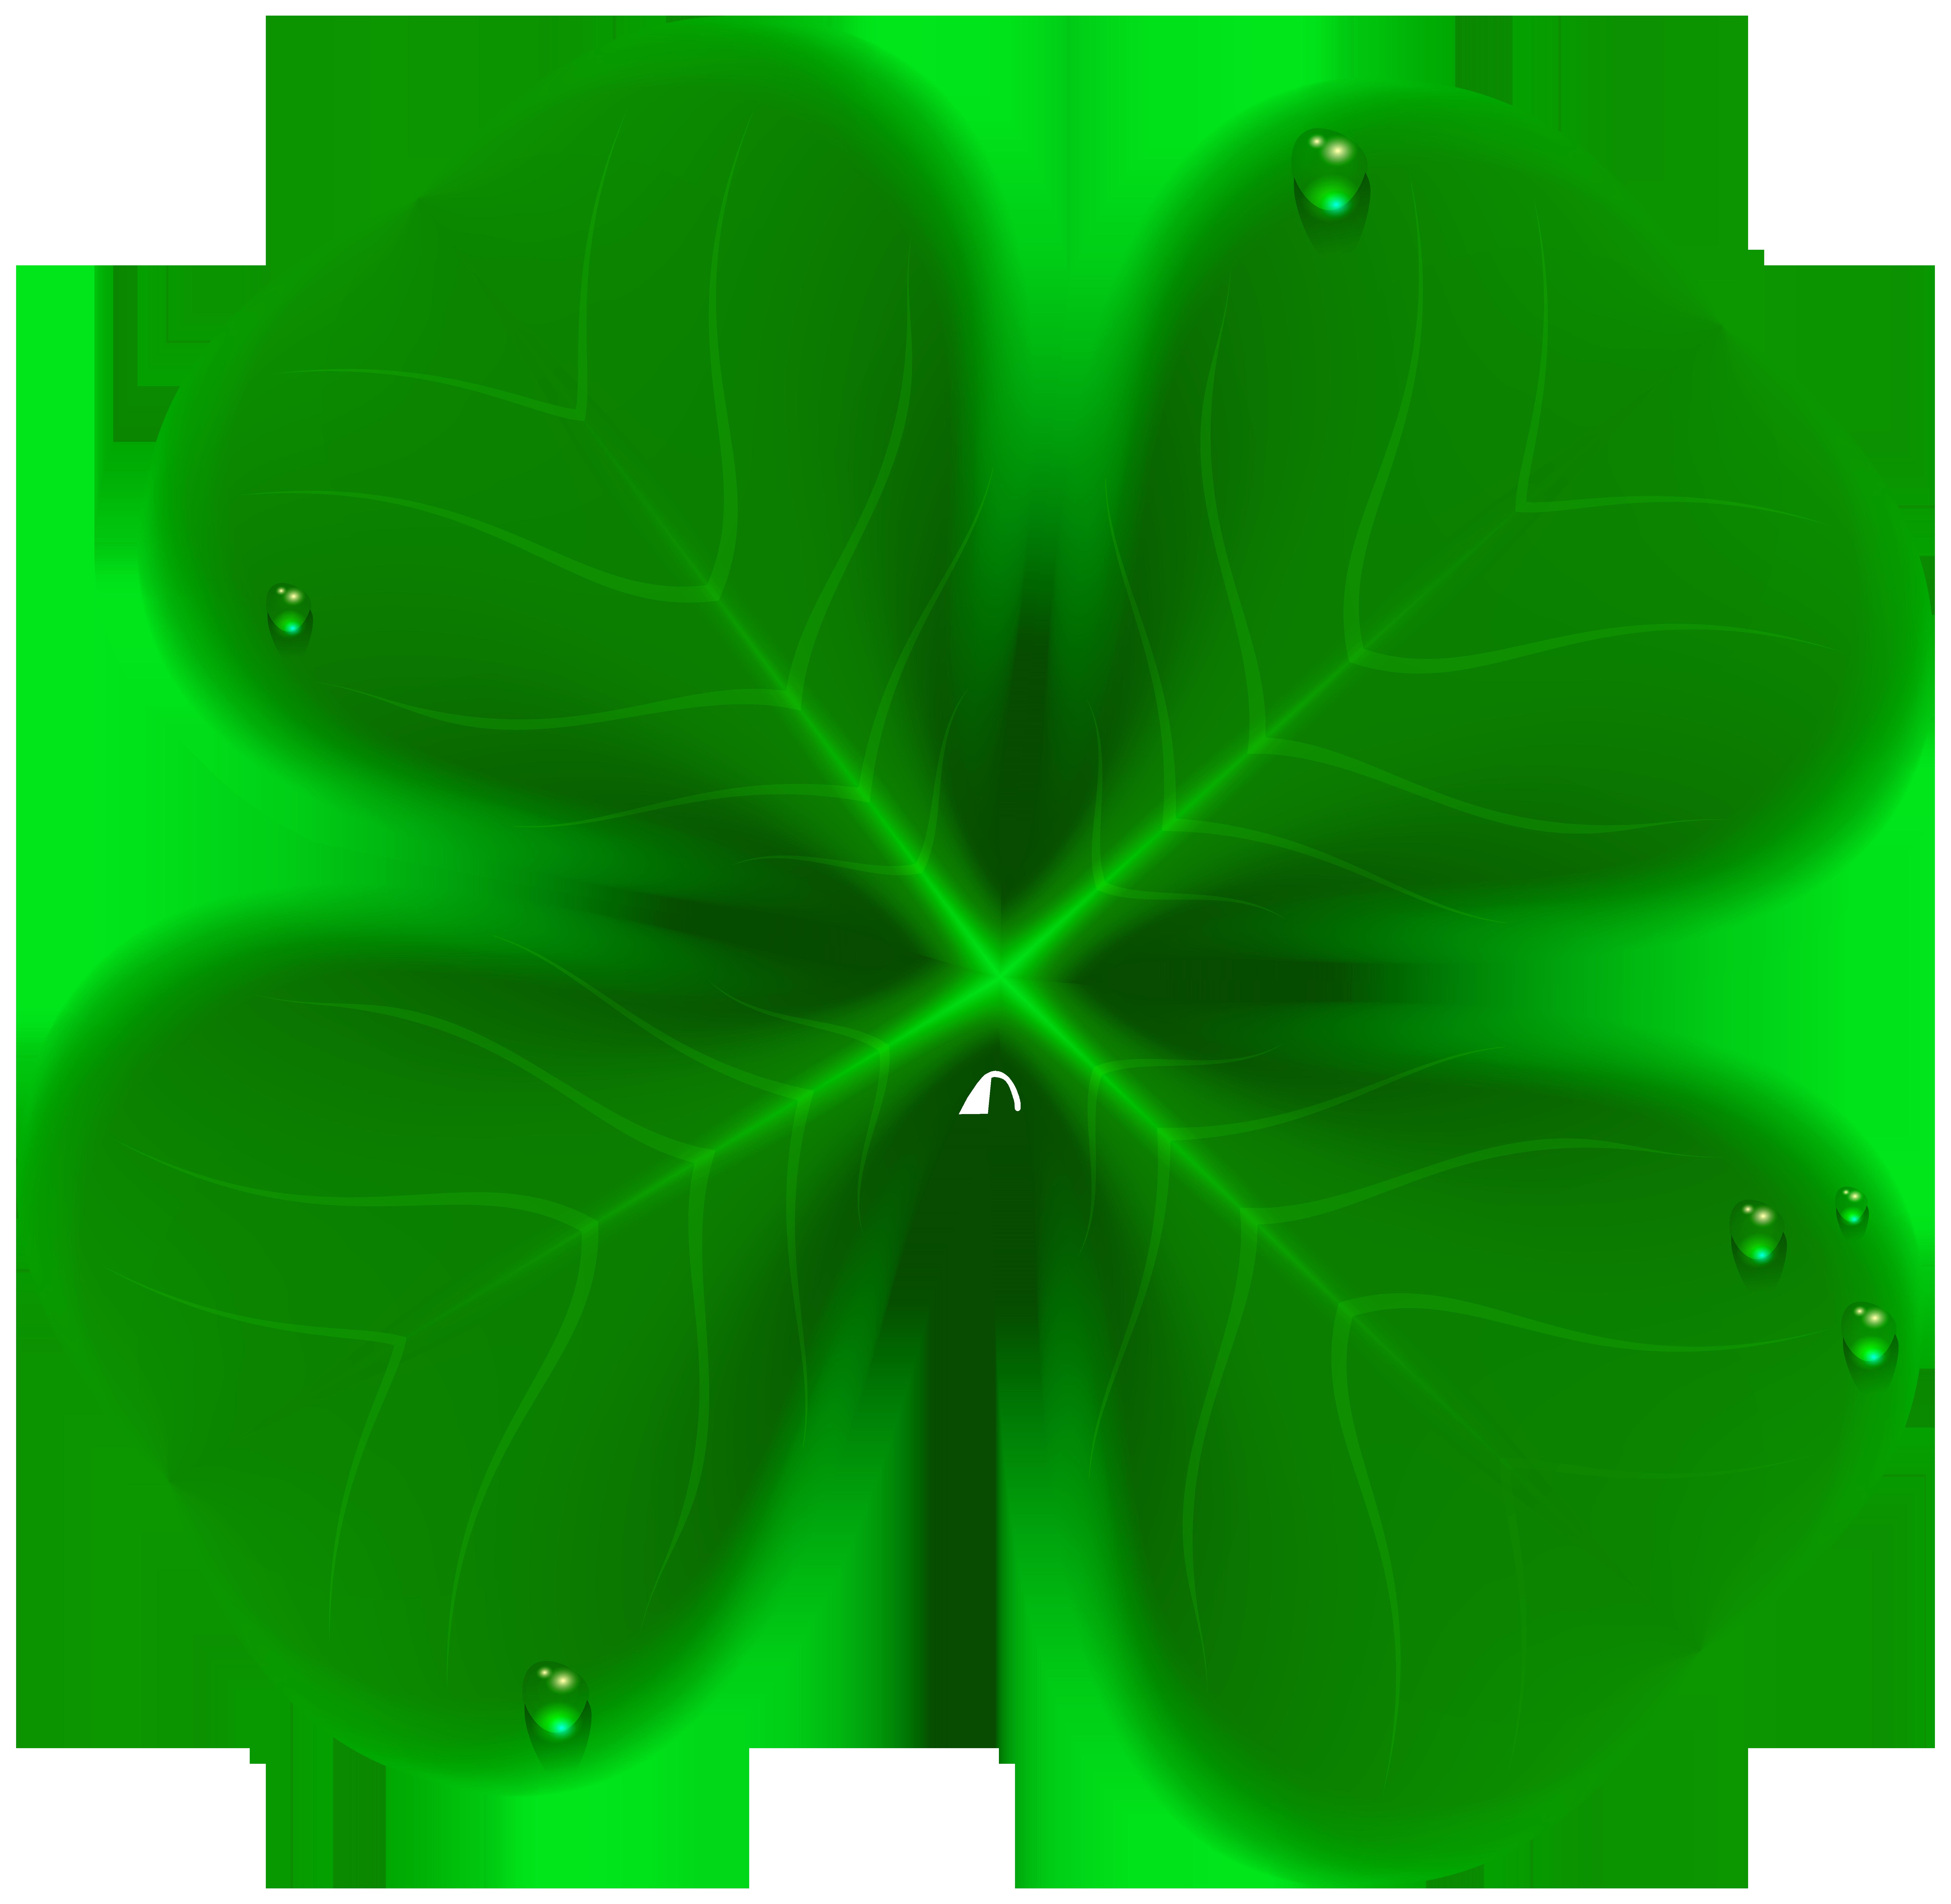 Four Leaf Clover Transparent Clip Art Image.